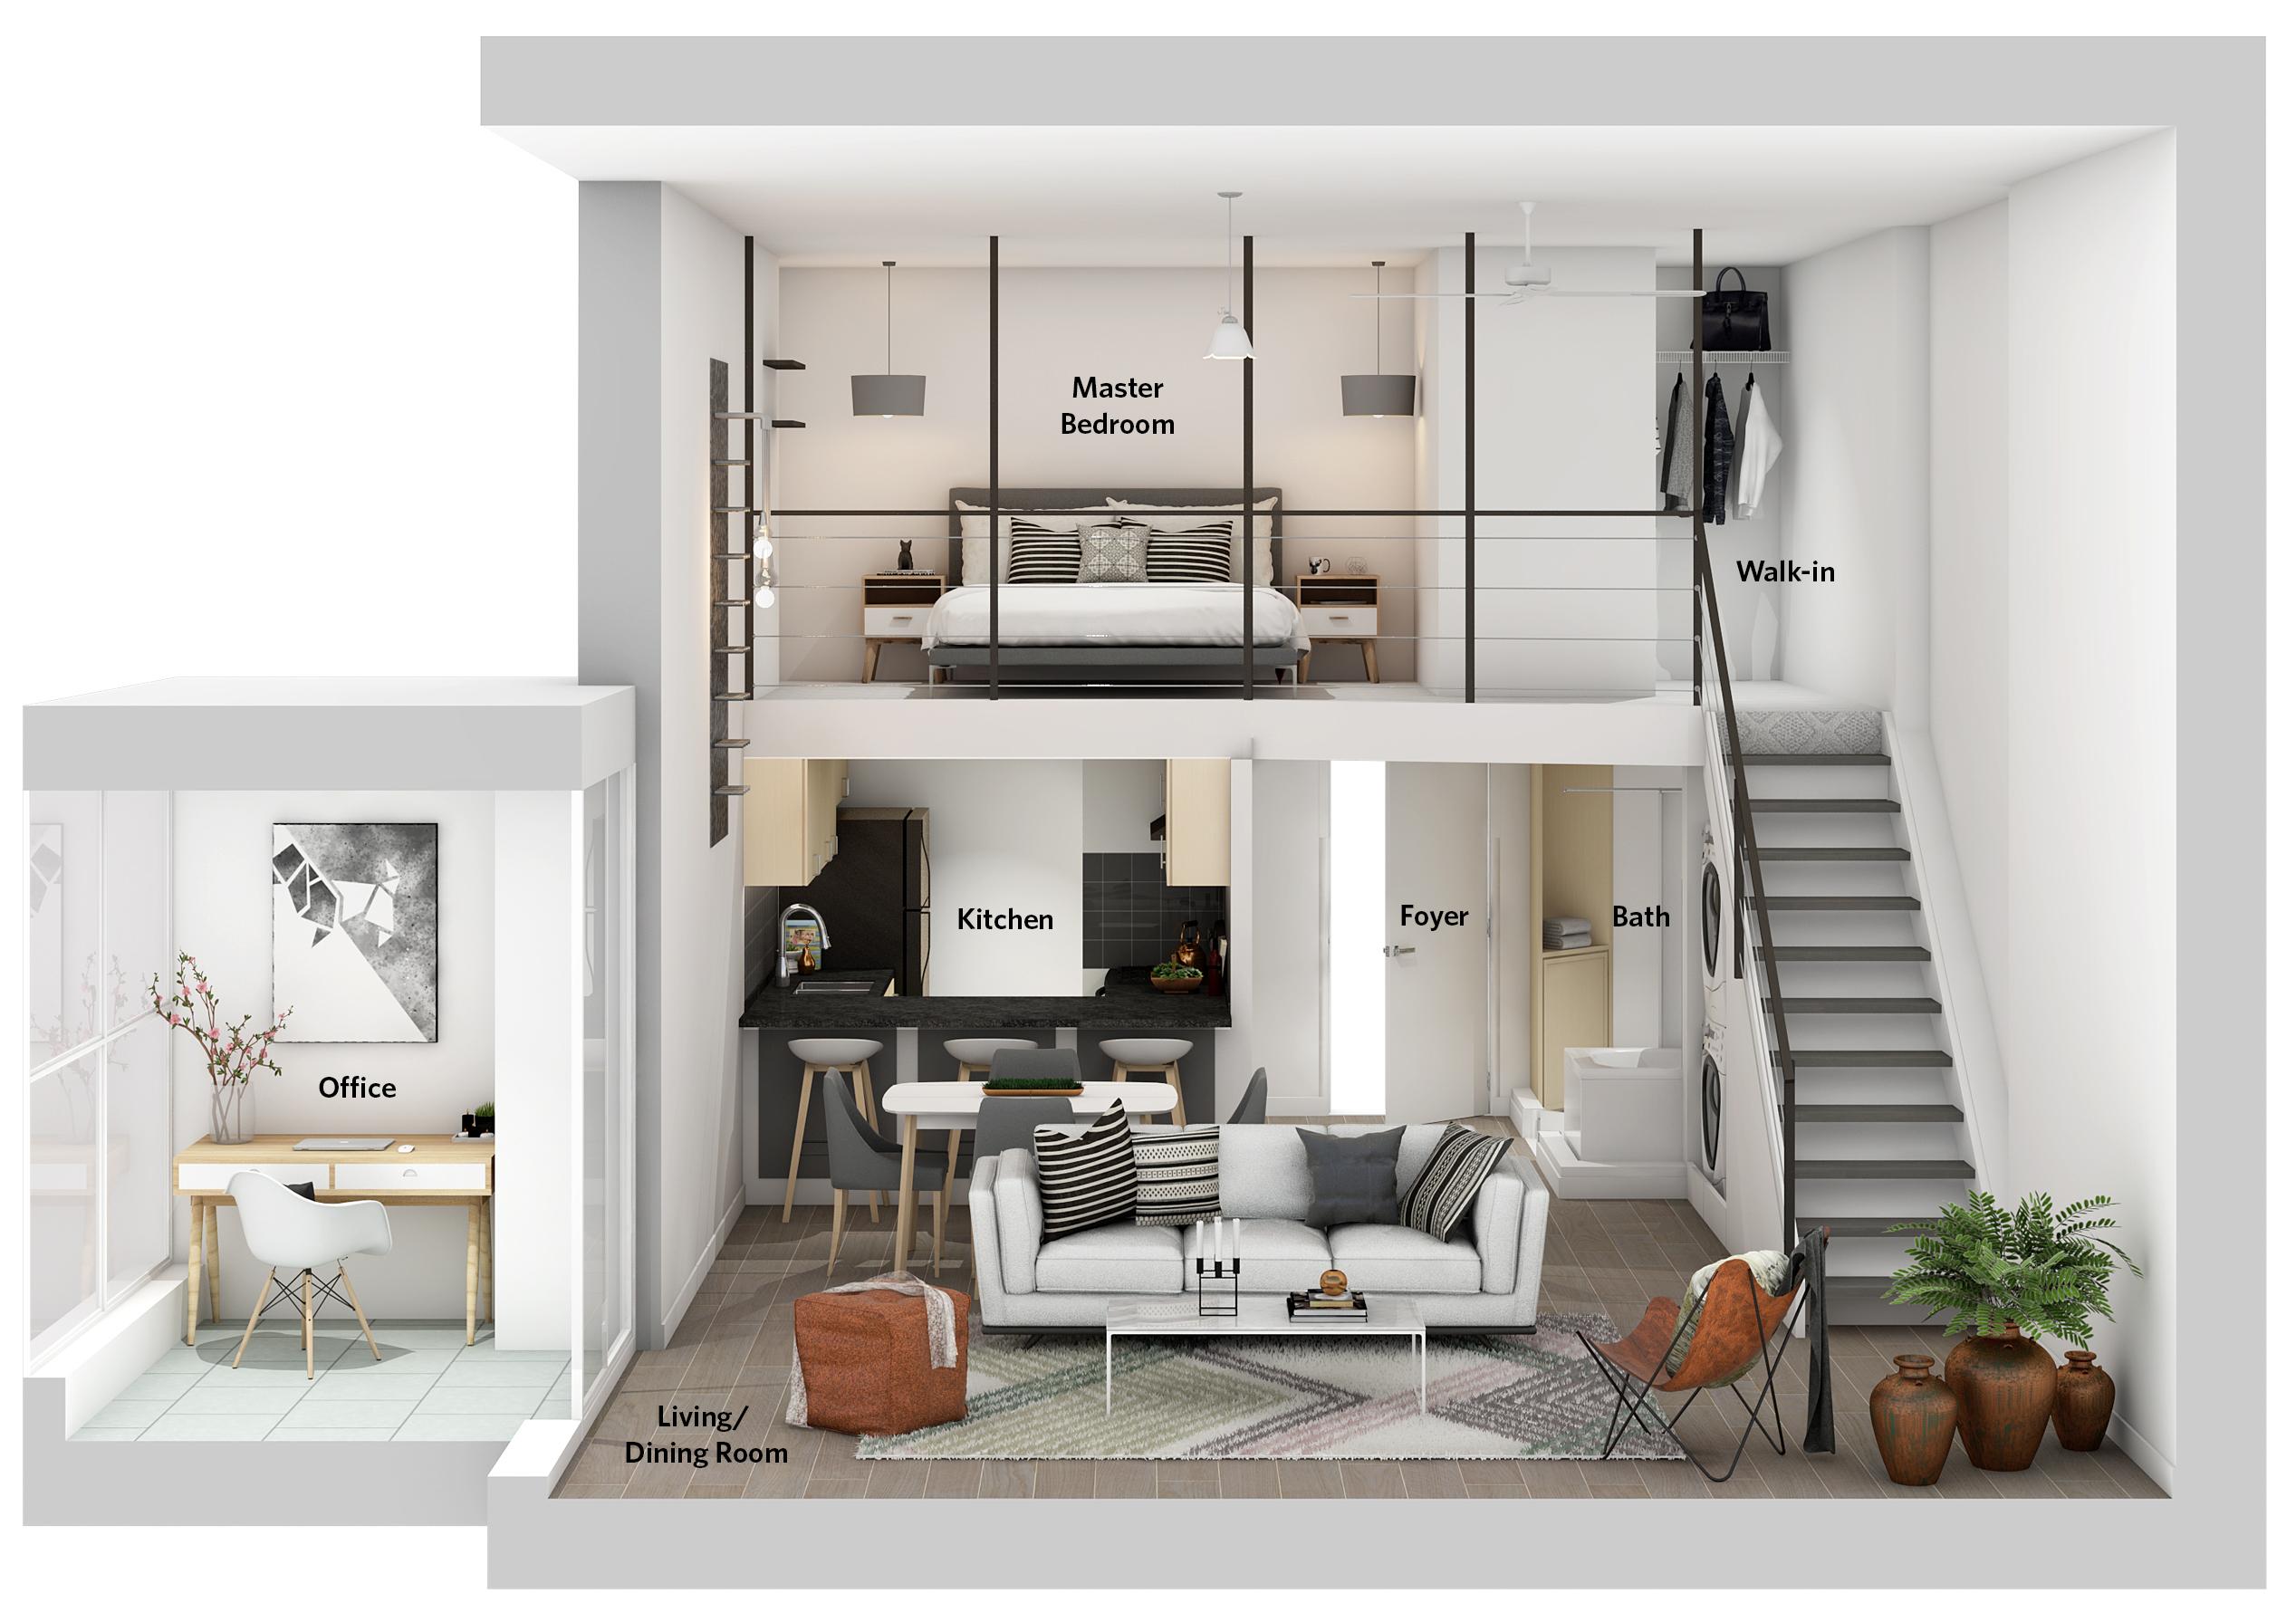 R2430564 - 1238 Seymour St Floor Plan Rendering -  Paul Albrighton